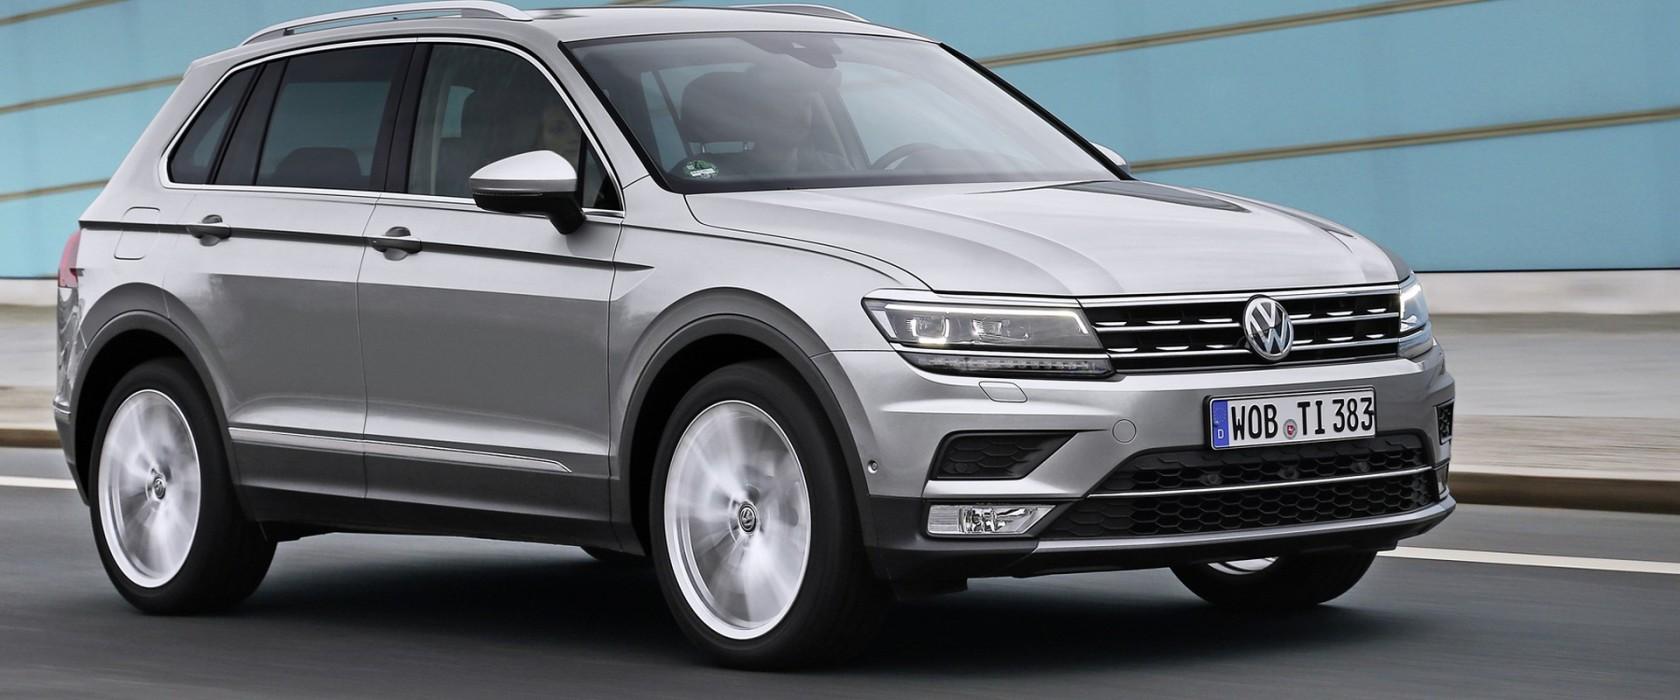 VolkswagenTiguanMY16-apertura